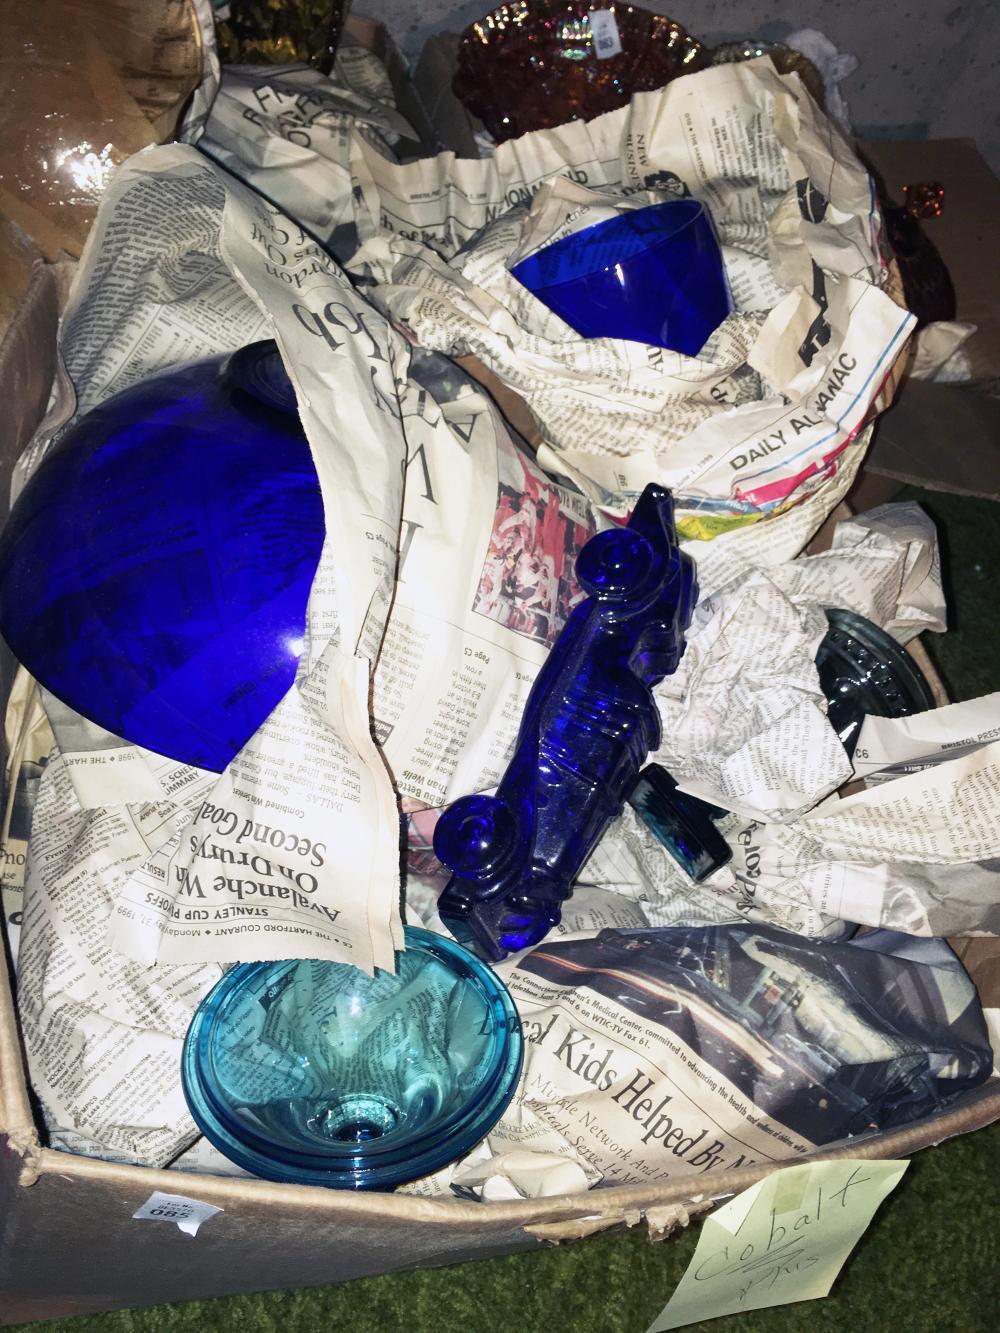 Cobalt Blue Glass Discovery Lot